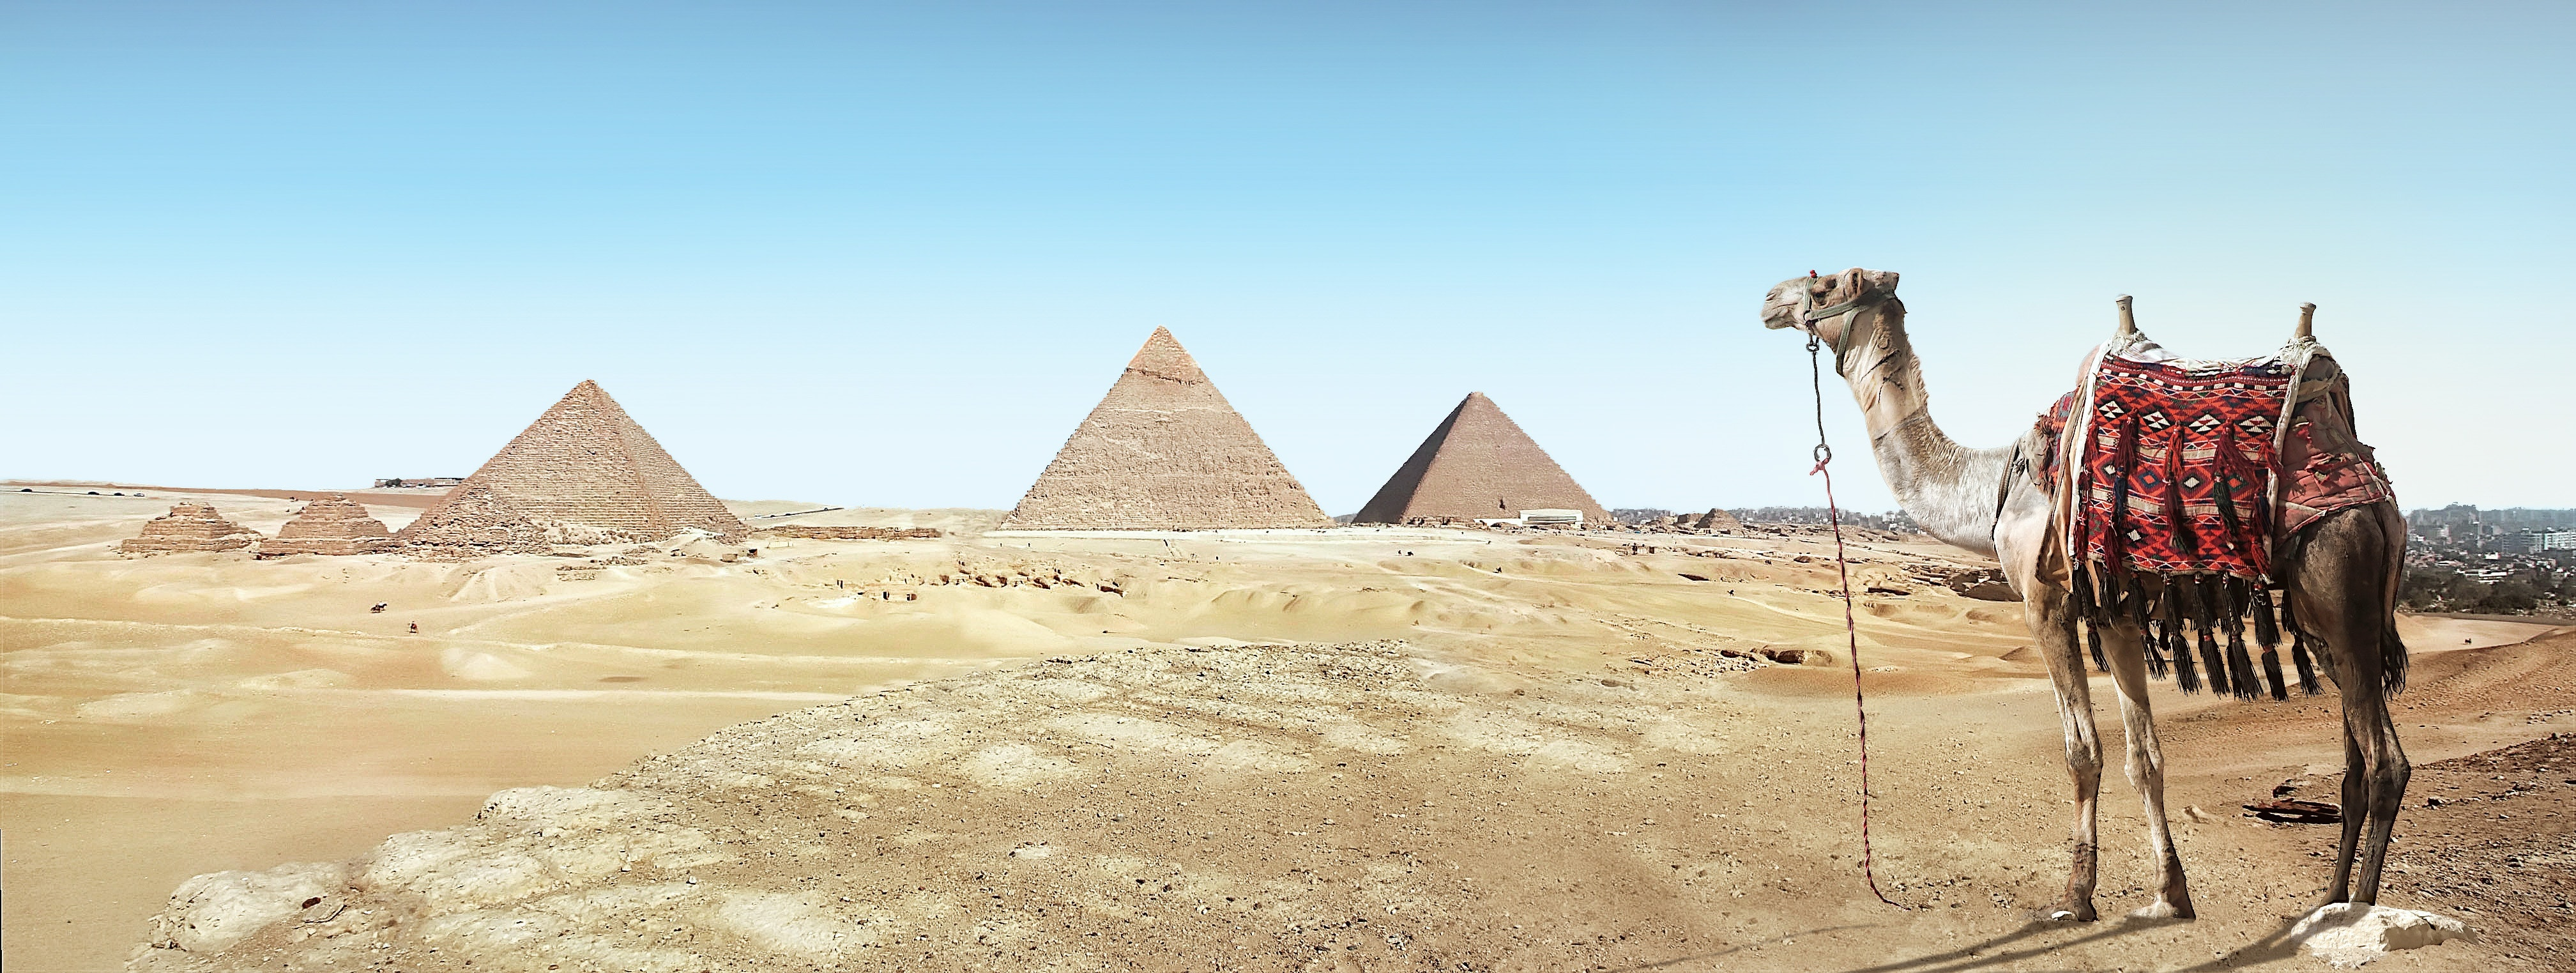 Voyage Egypte